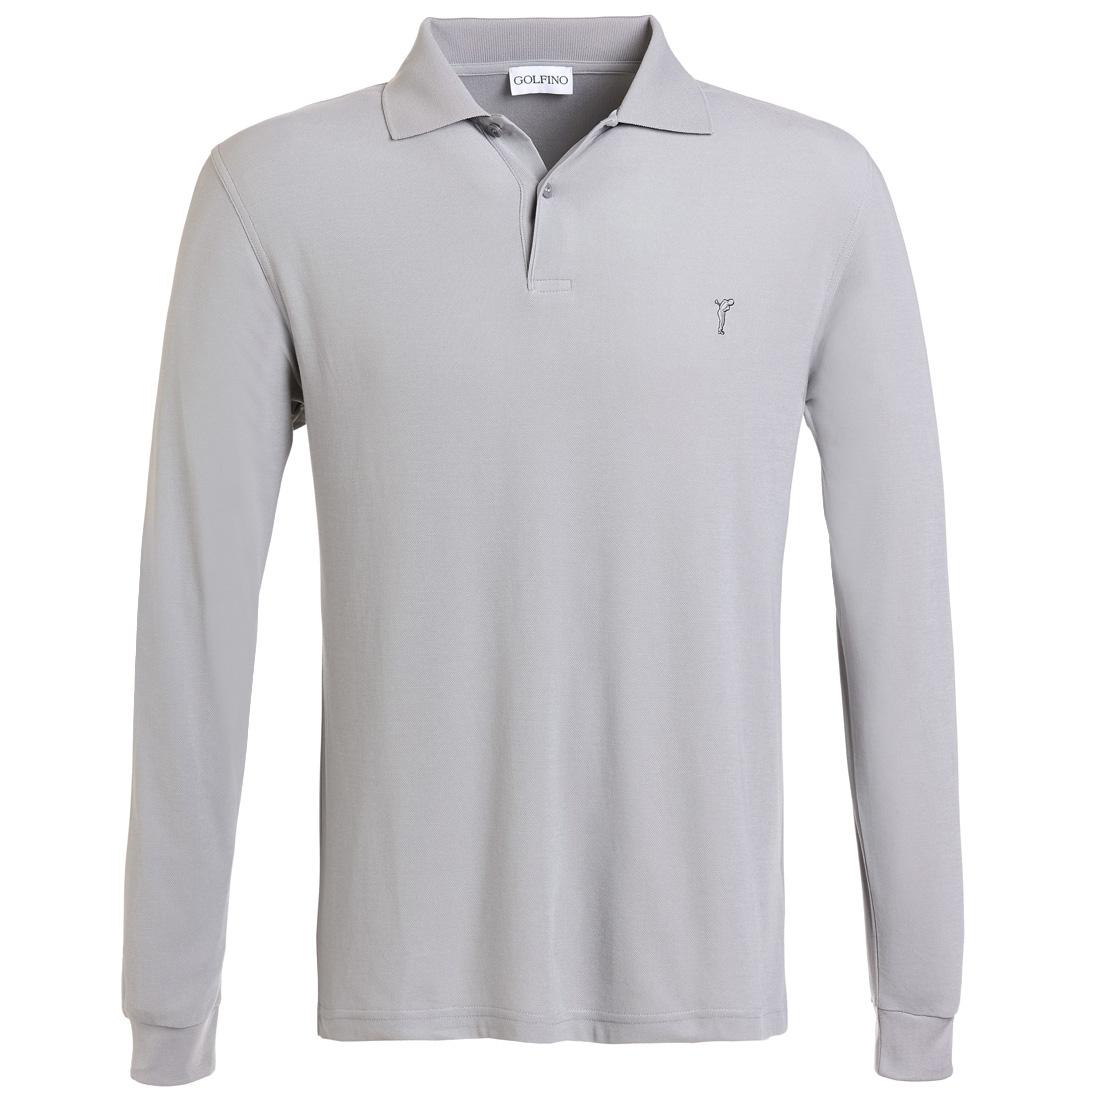 Extra Dry Herbst Poloshirt gebürstet Grau